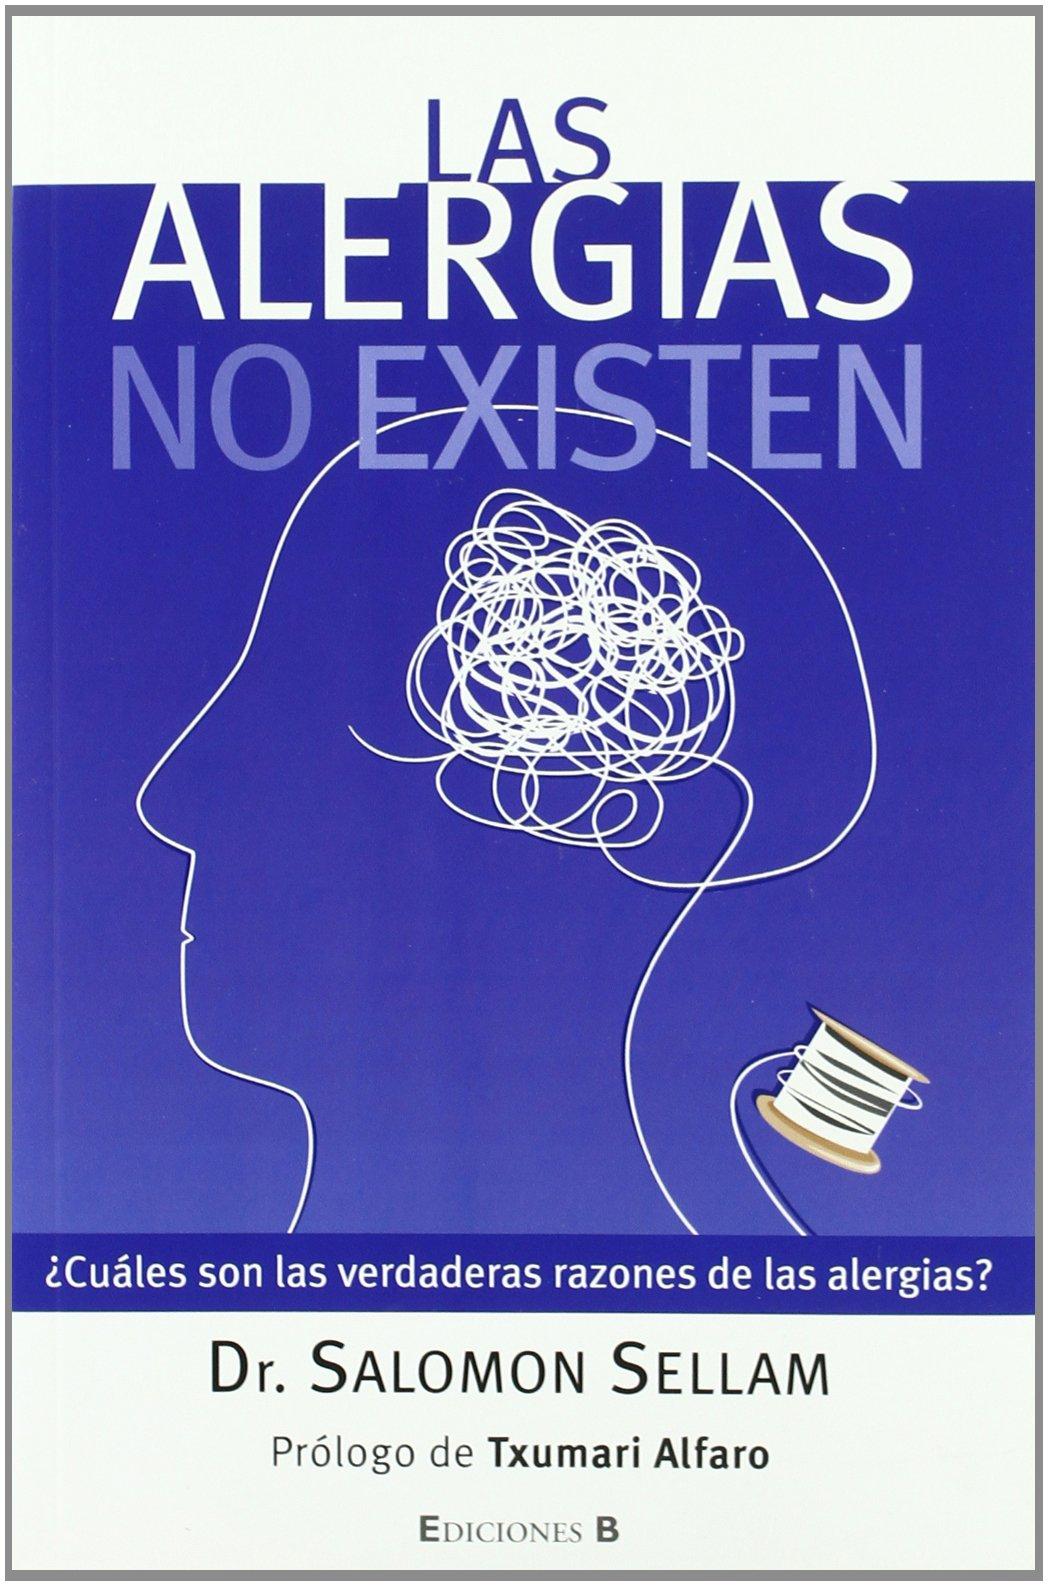 SALOMON SELLAM LIBROS PDF @tataya.com.mx 2020